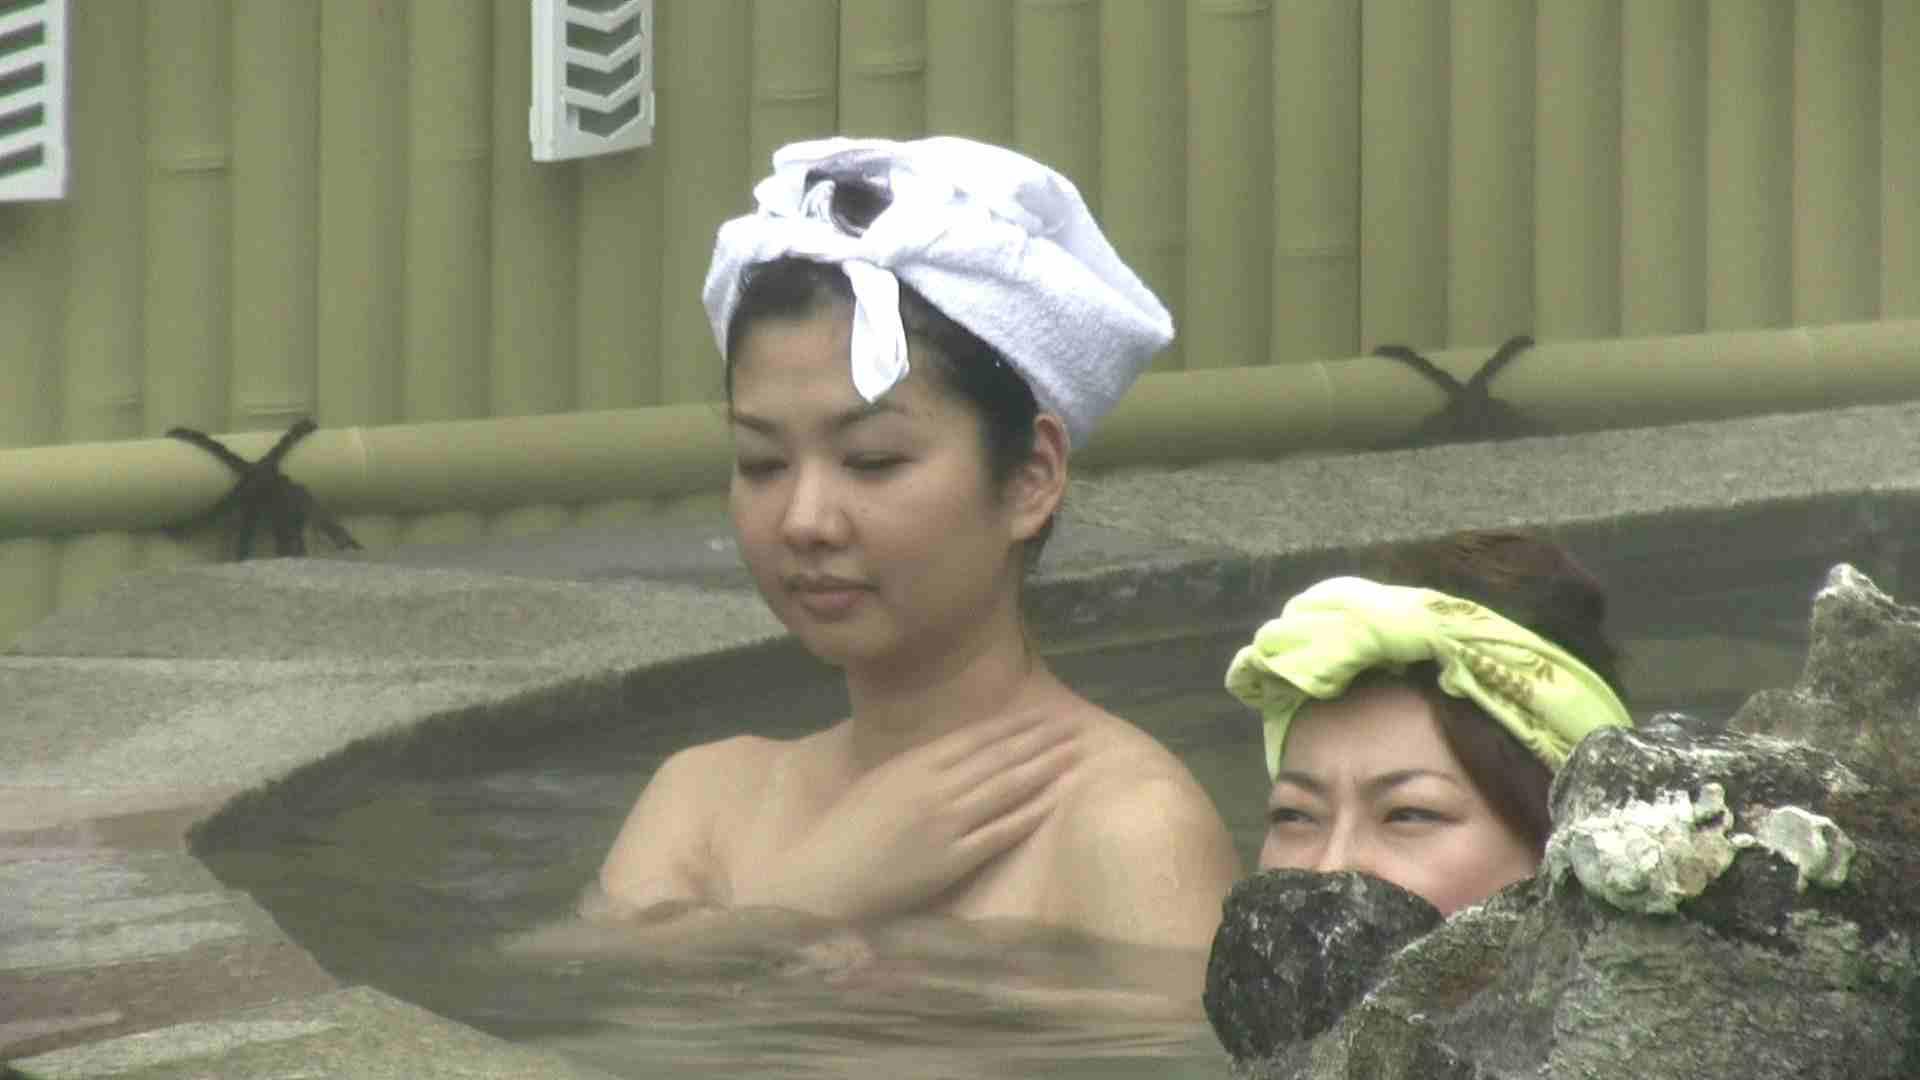 Aquaな露天風呂Vol.192 美しいOLの裸体 えろ無修正画像 101pic 2